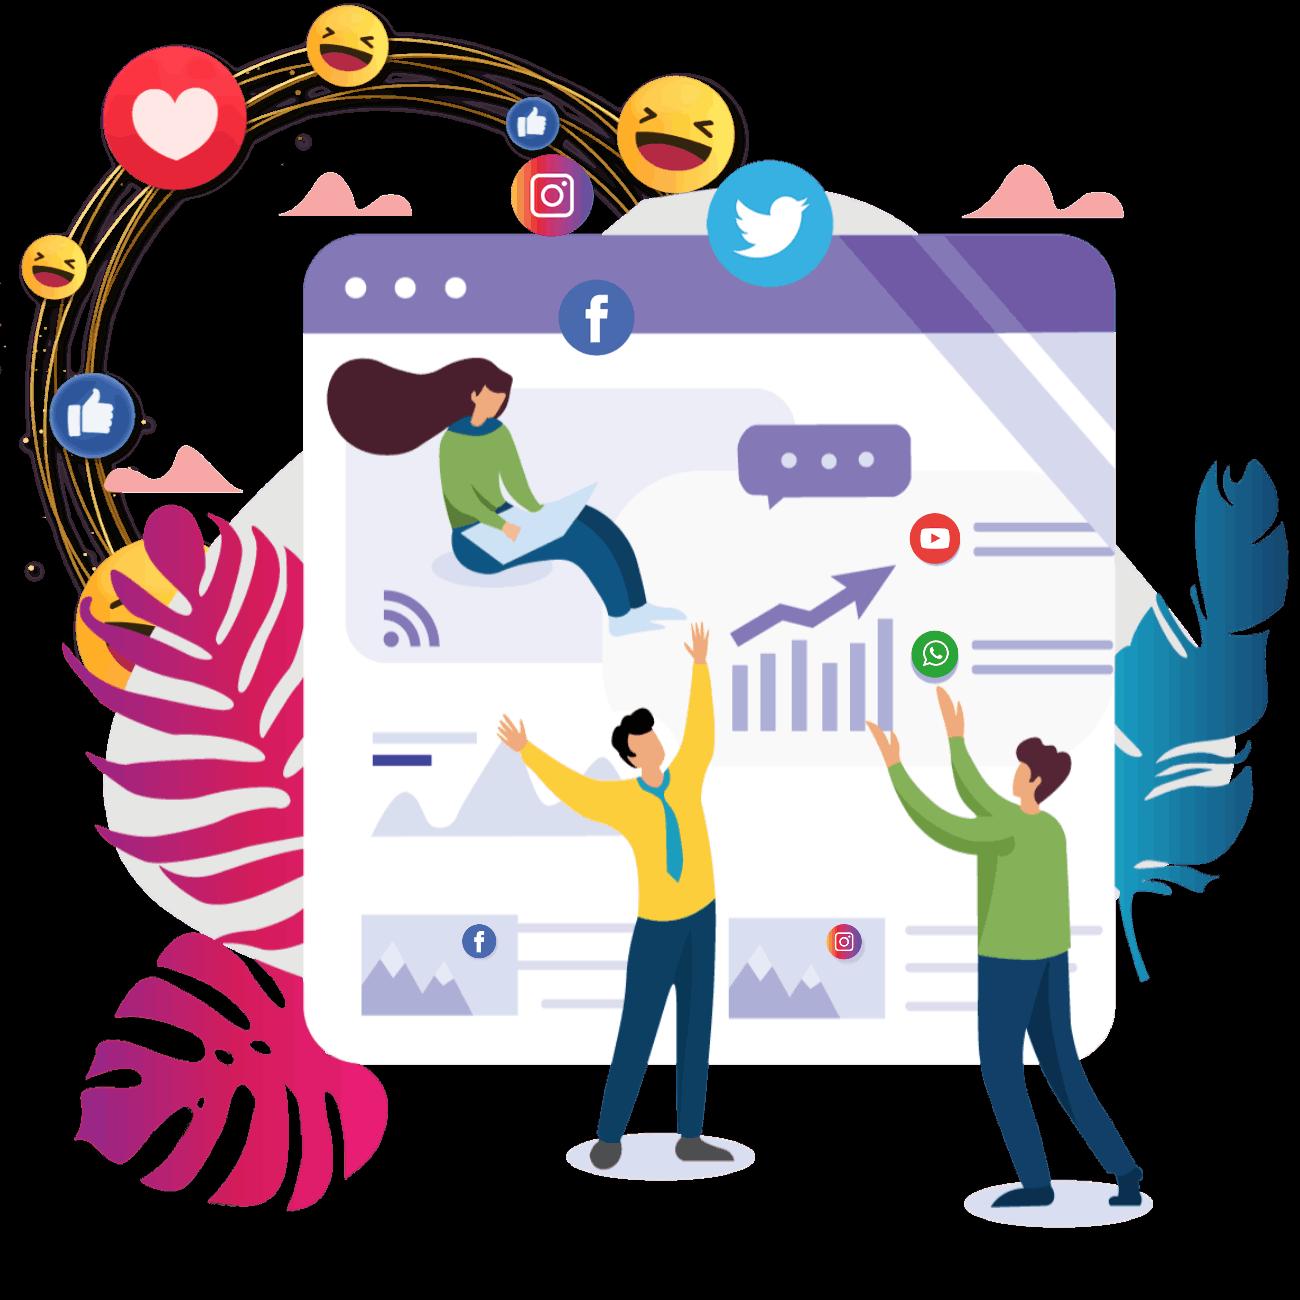 MULTIPLE SOCIAL MEDIA PROFILES